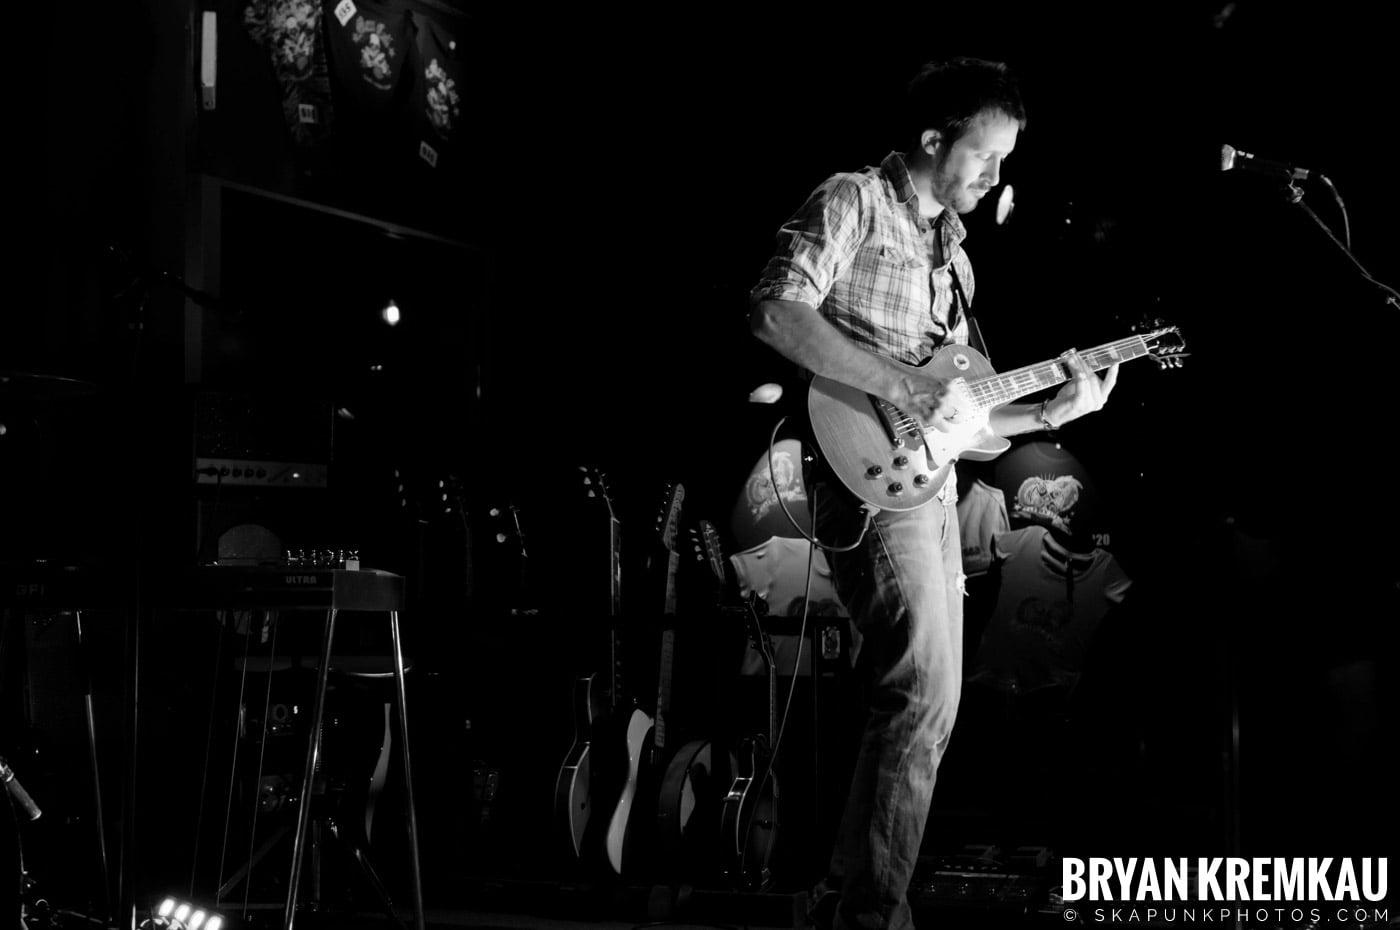 Carbon Leaf @ Mexicali Live, Teaneck NJ - 6.21.12 (11)